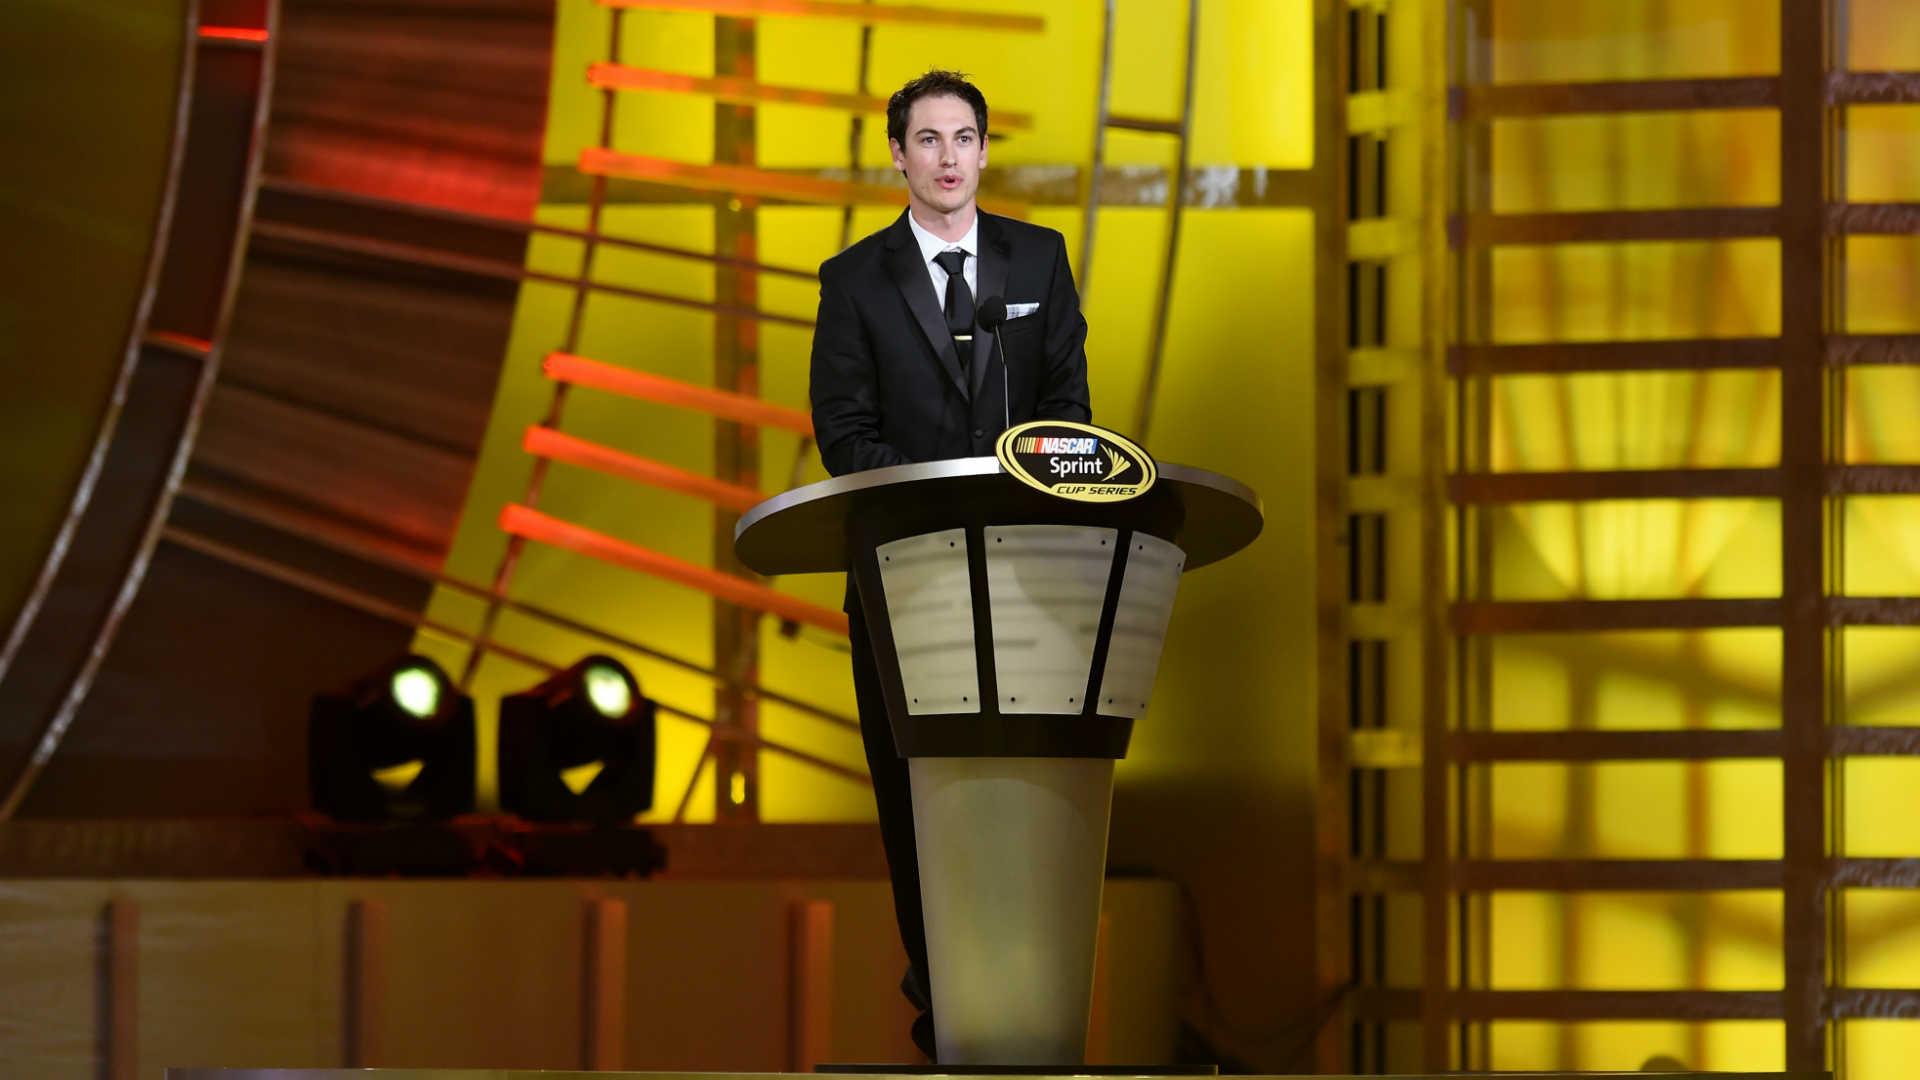 joey-logano-sprint-cup-series-awards-120614-getty-ftr.jpg